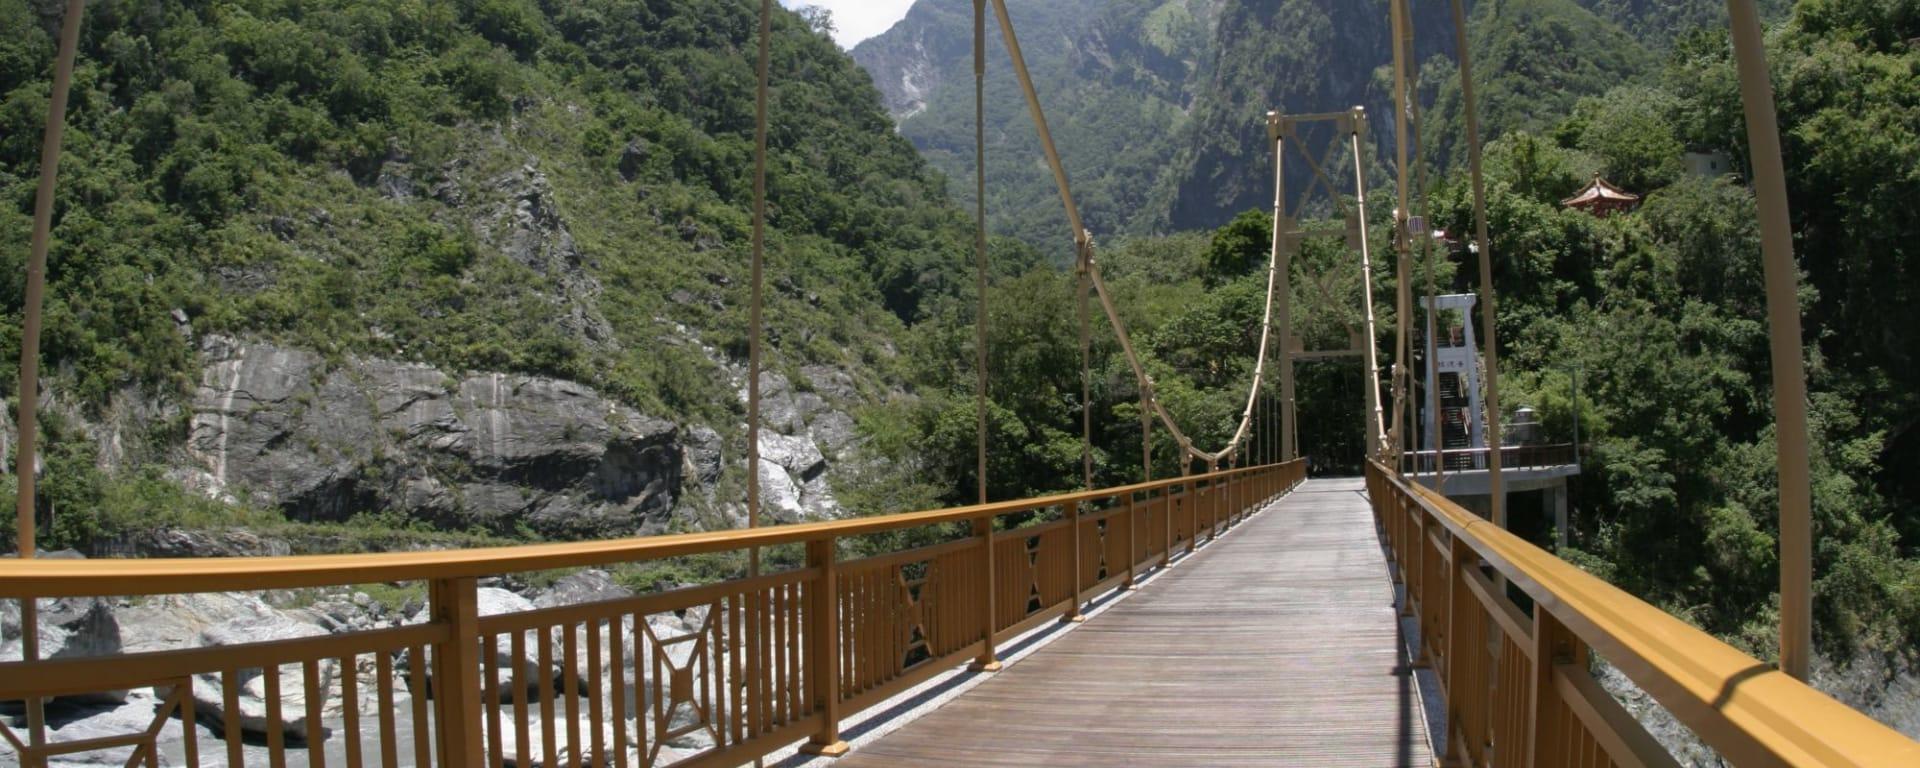 Les hauts lieux de Taïwan de Taipei: Tienhsiang Taroko National Park